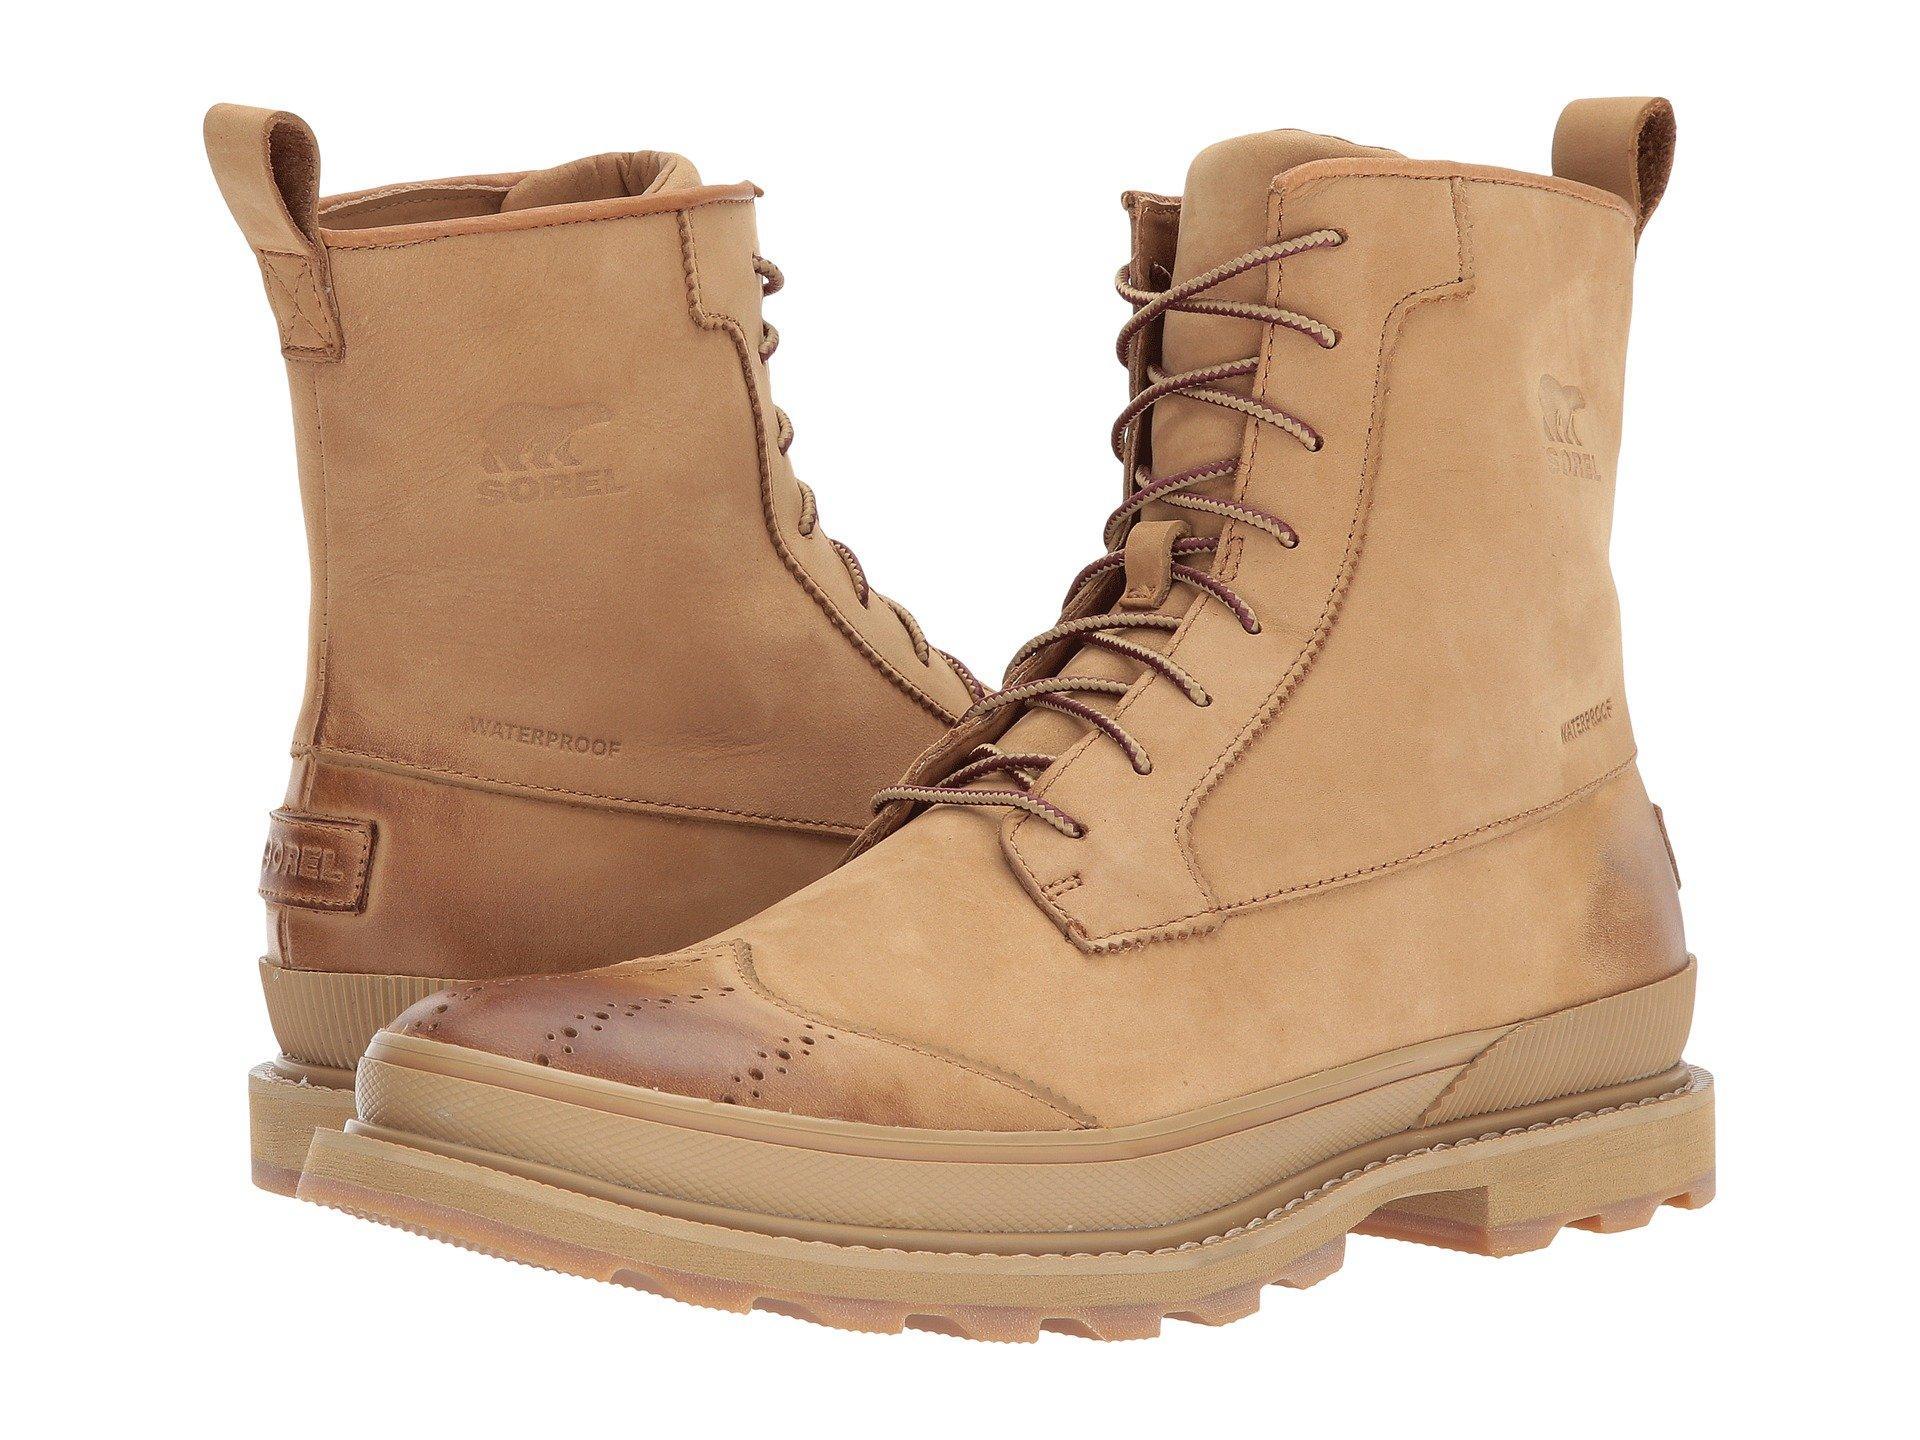 95df2d263 Madson Wingtip Boot Waterproof, Buff/Crouton